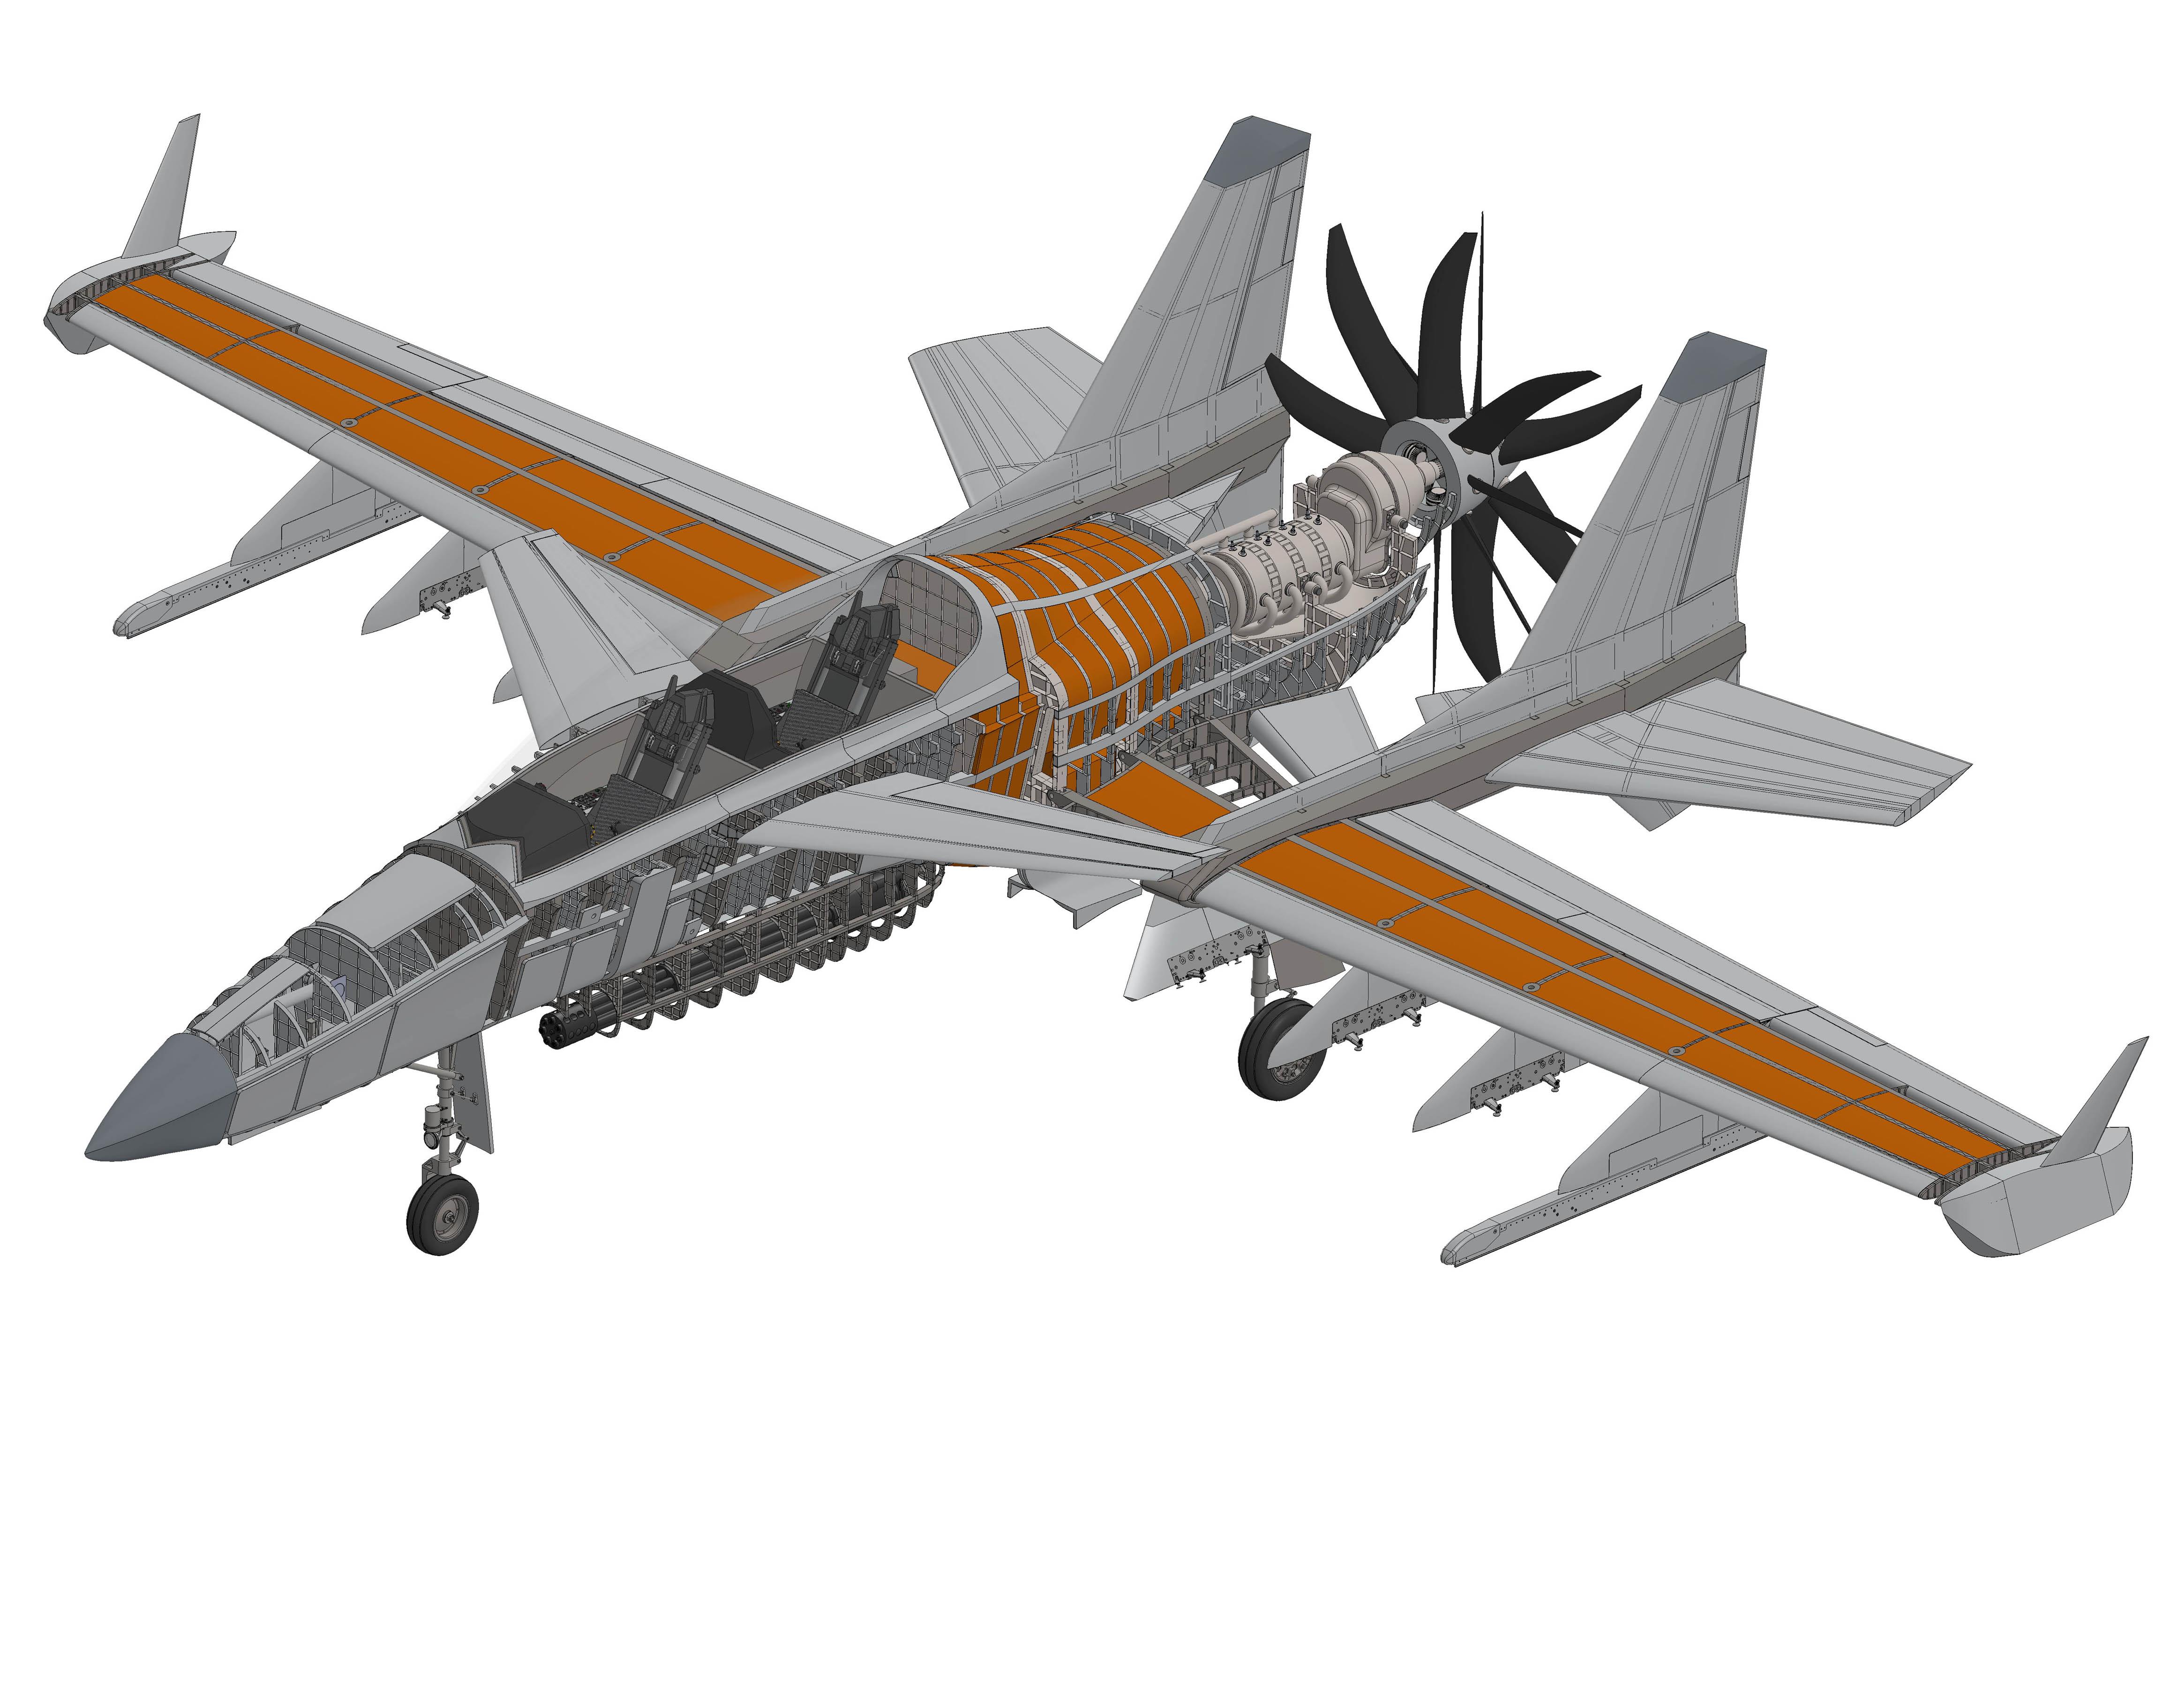 Stavatti, Stavatti Aerospace, SM-27, SM-27T, SM-27S, SM27, Machete